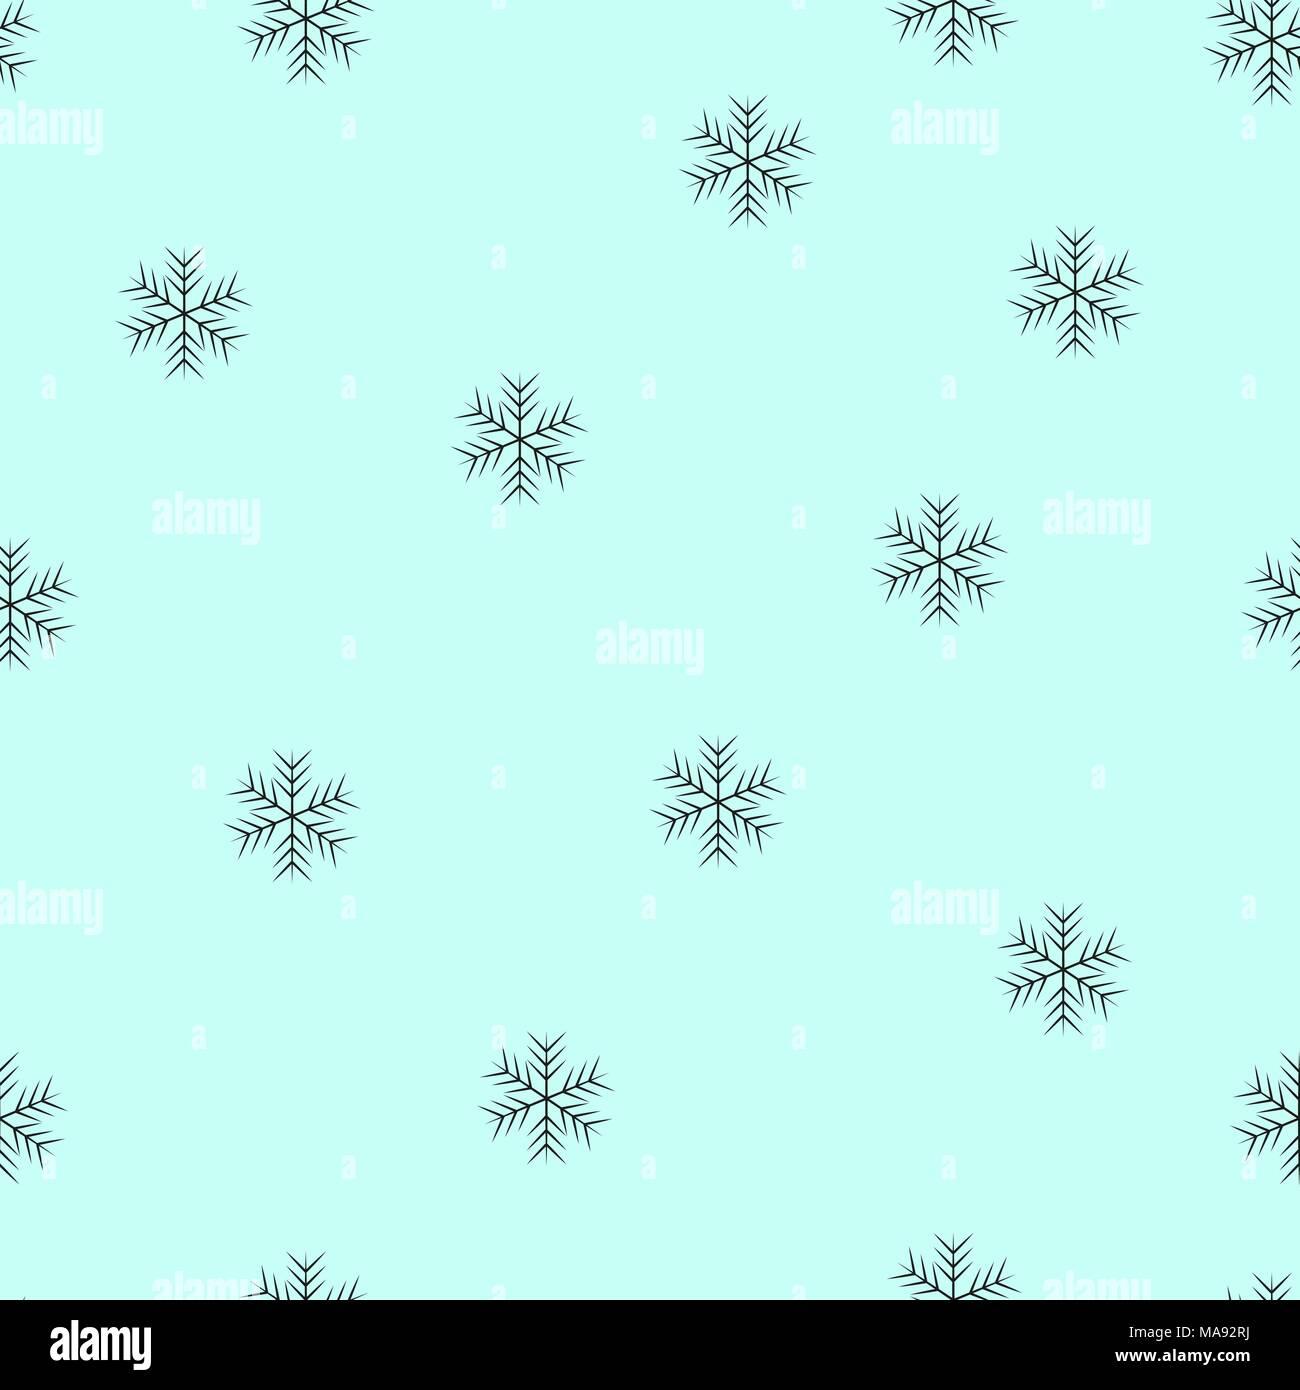 Bluish Grey Color Stock Photos & Bluish Grey Color Stock Images - Alamy